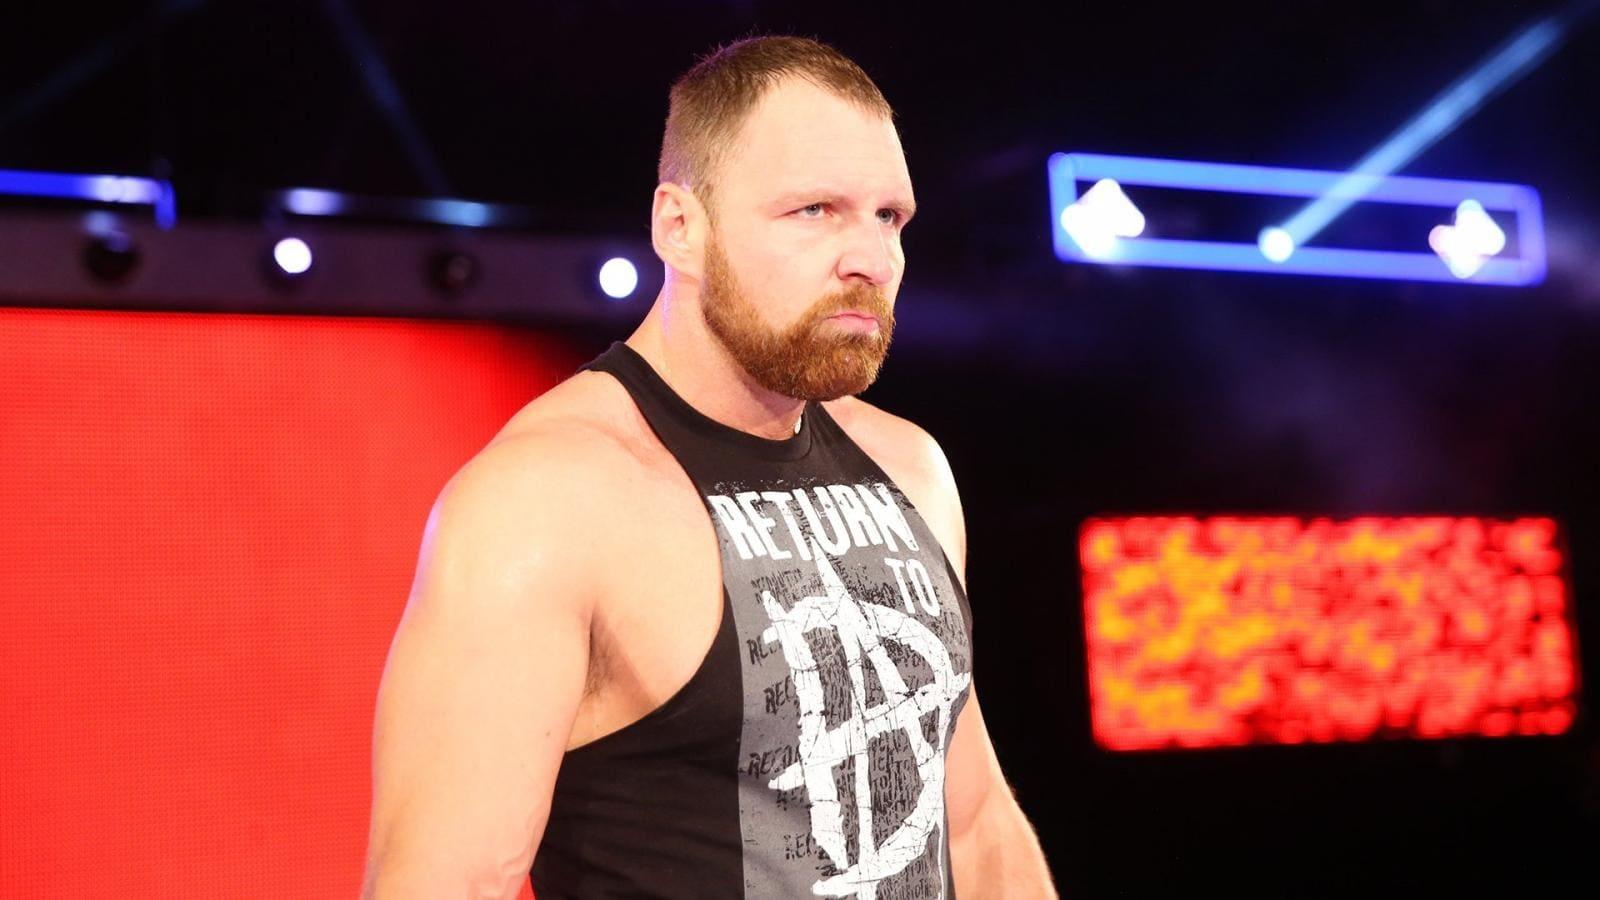 WWE Raw Season 26 :Episode 33  August 13, 2018 (Greensboro, NC)